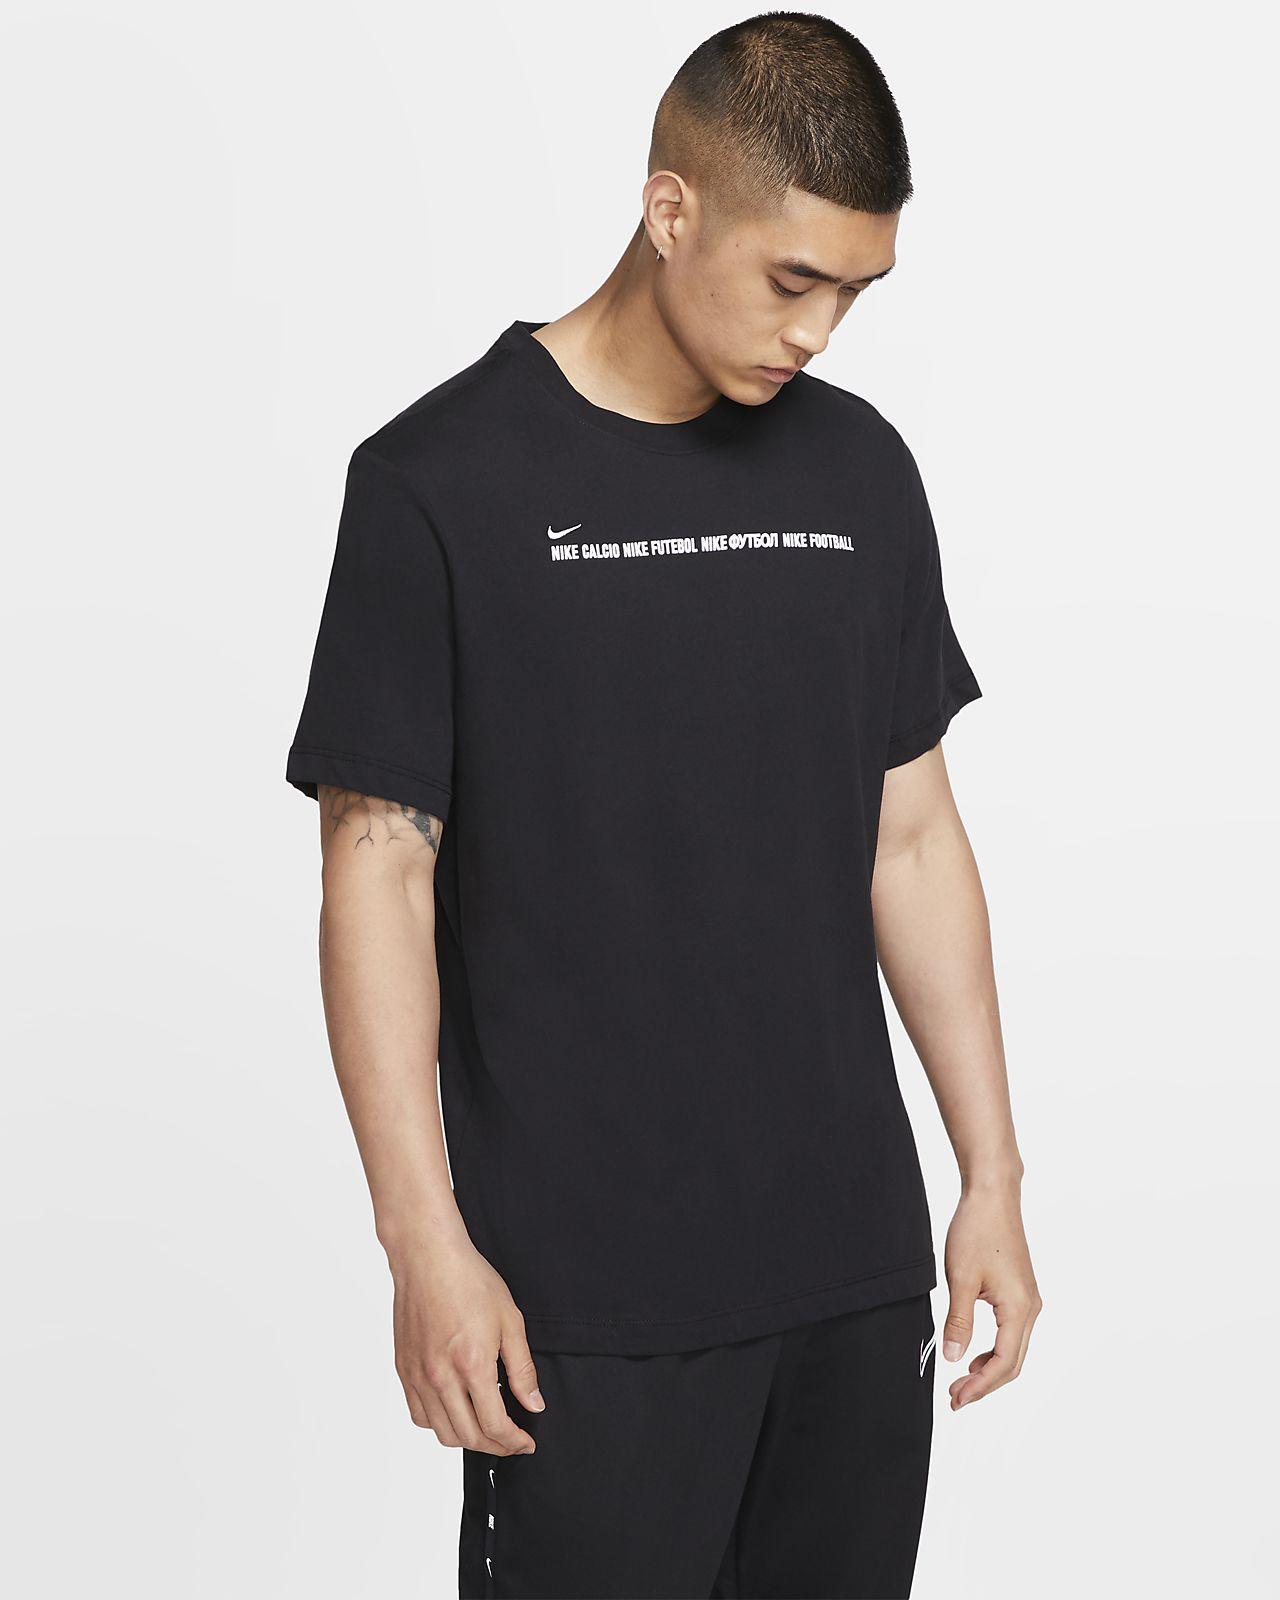 Nike F.C. Men's Football T-Shirt